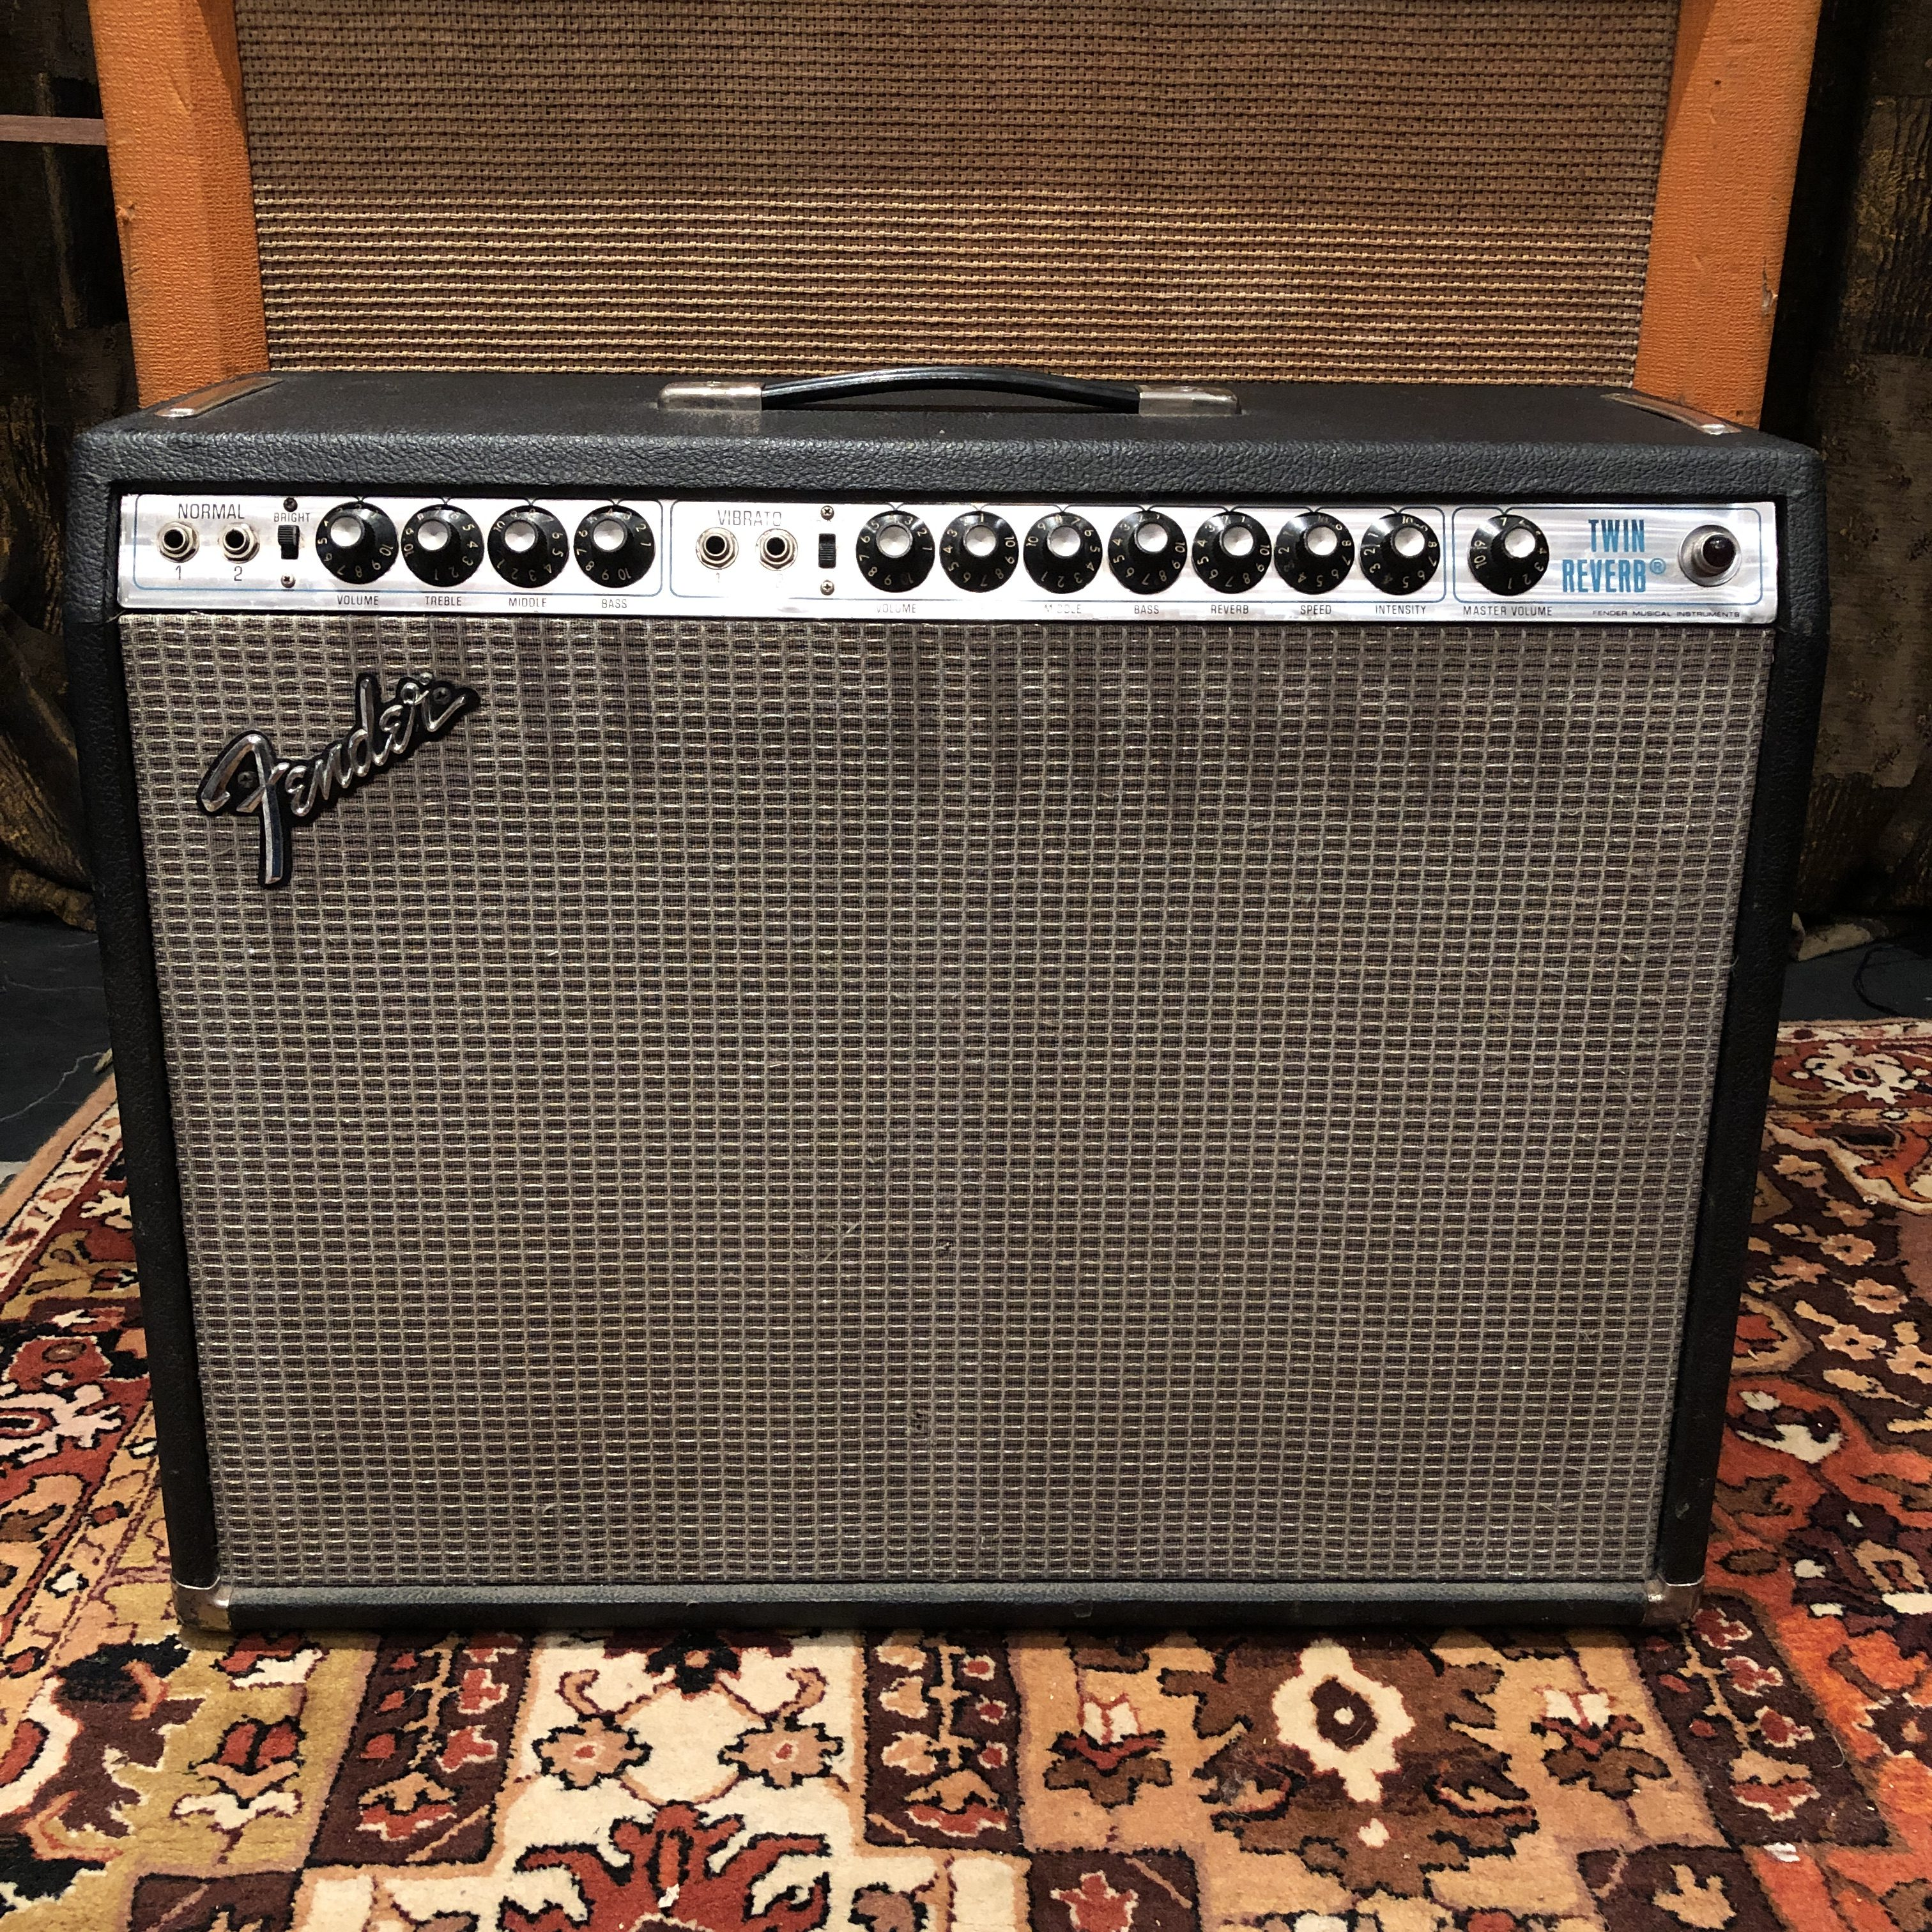 Vintage 1977 Fender Twin Reverb Silverface Valve Amplifier Combo